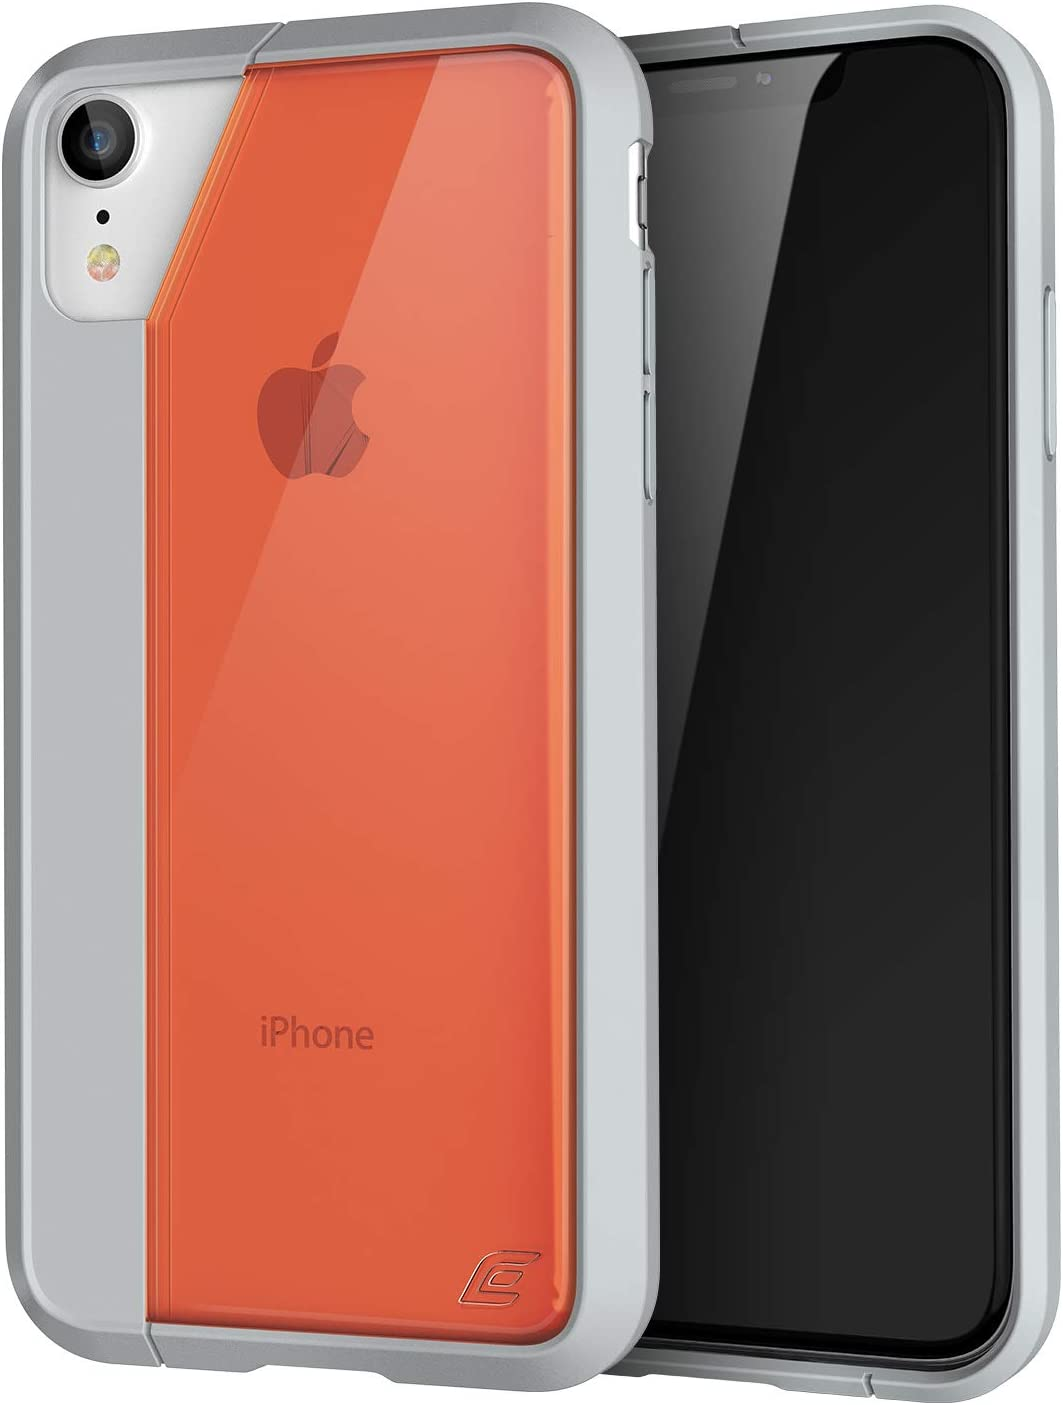 Illusion for iPhone XR - Orange: Amazon.es: Electrónica